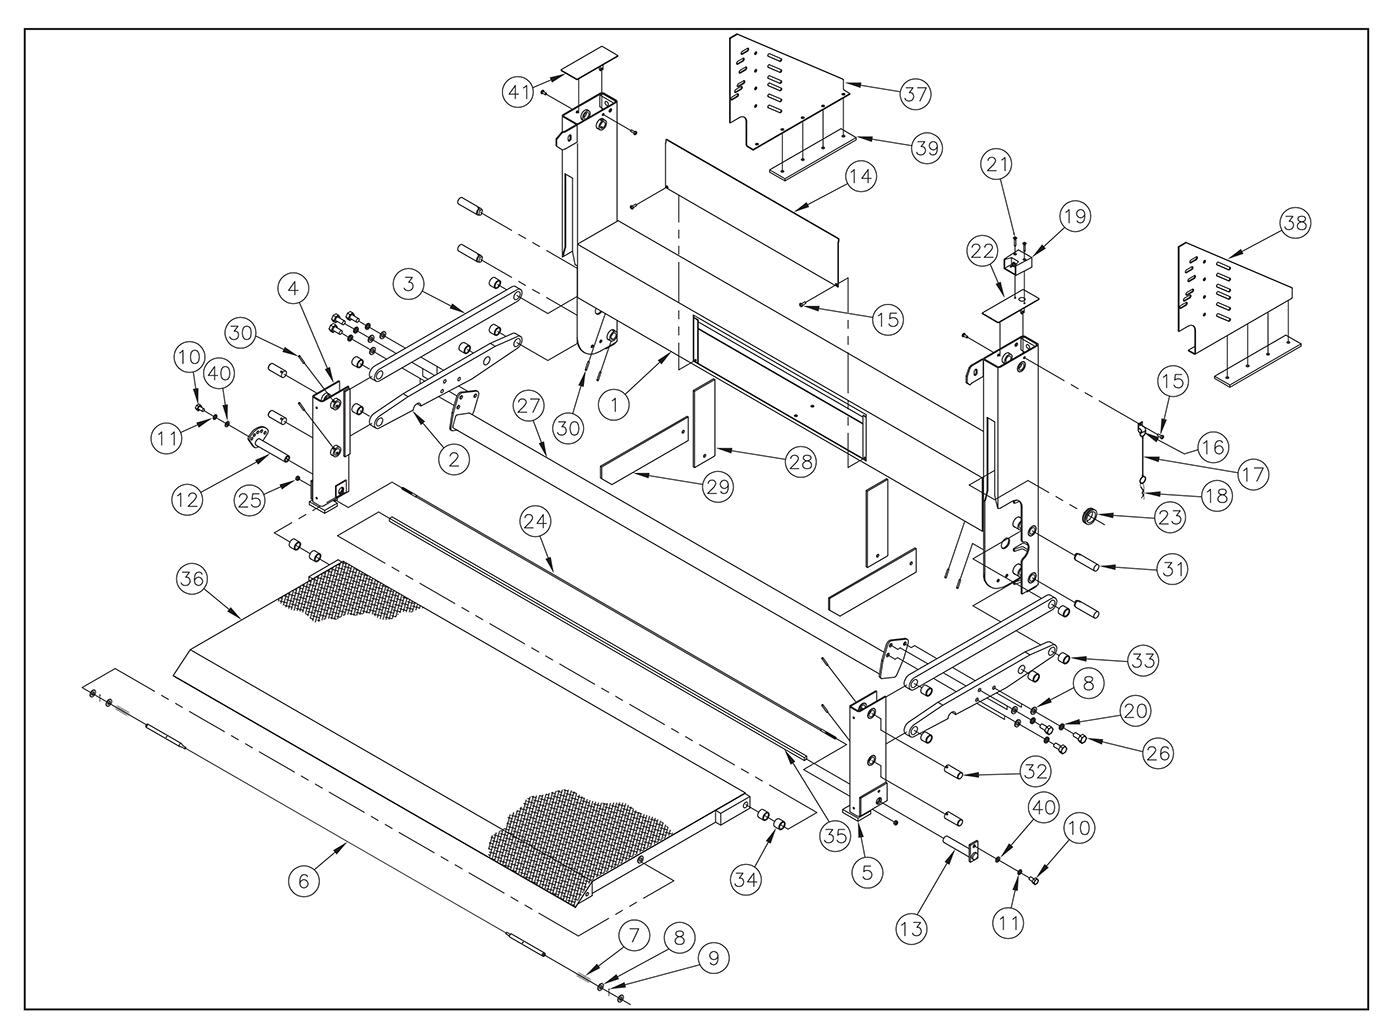 Undercarriage diagram 2013 ford utility wiring diagram at ww2 ww w freeautoresponder